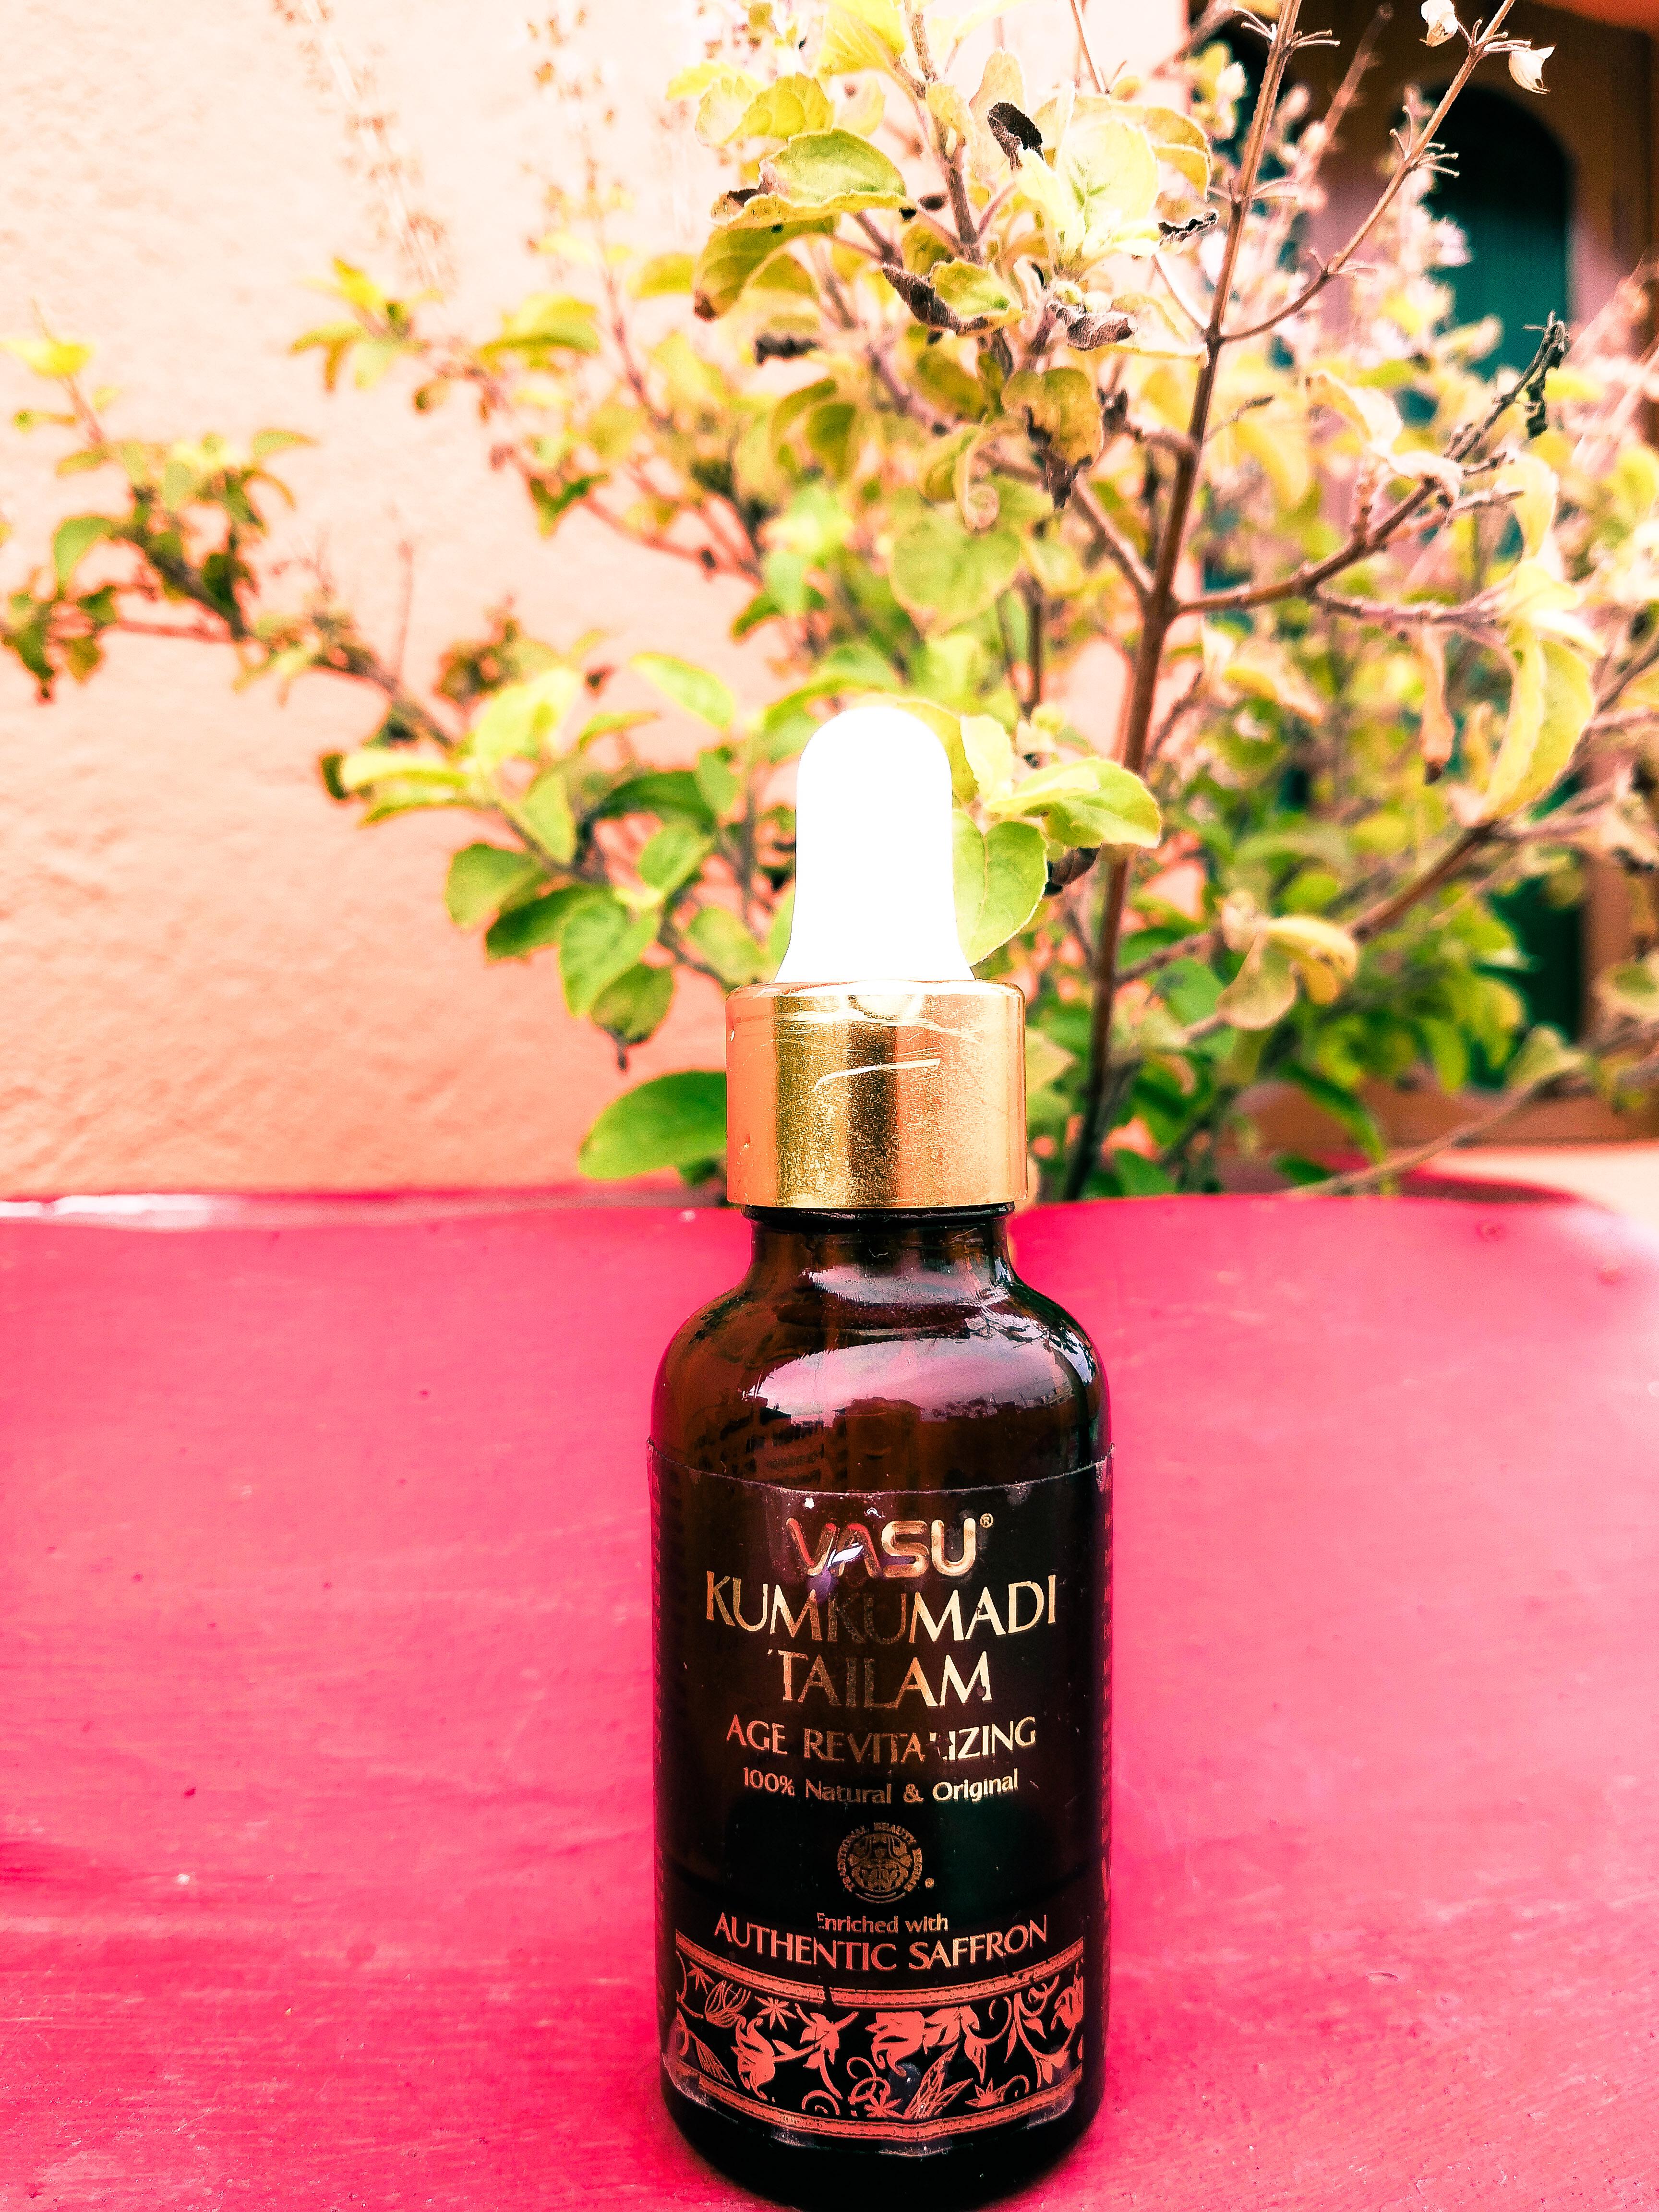 Vasu Age Revitalizing Kumkumadi Tailam-Improves skin texture with regular use-By susmita_talukdar